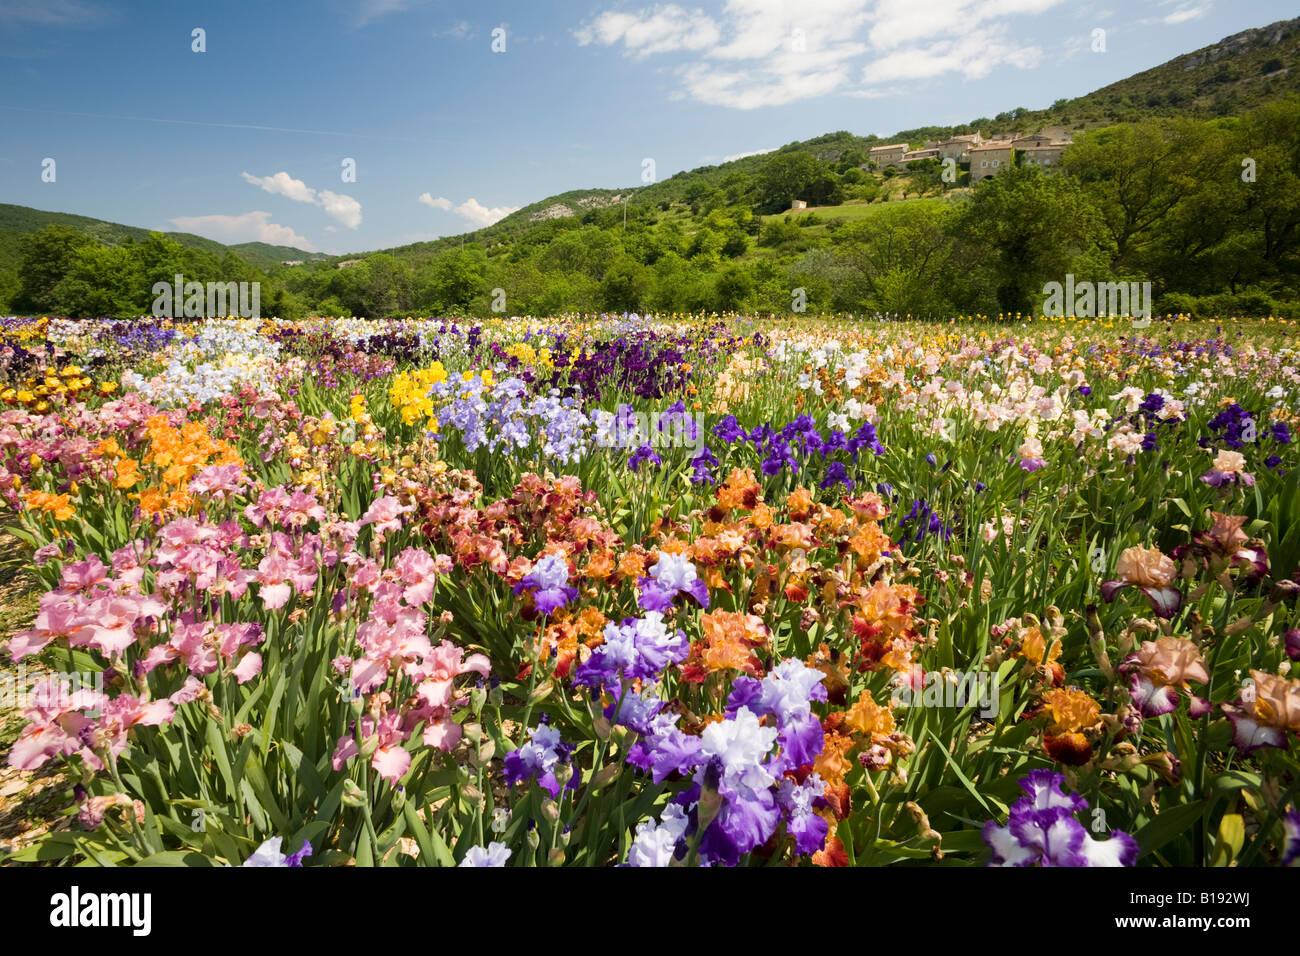 Iris cultivation (Iris germanica) in Ardeche (France). Culture d'Iris (Iris germanica) en Ardèche (France). - Stock Image